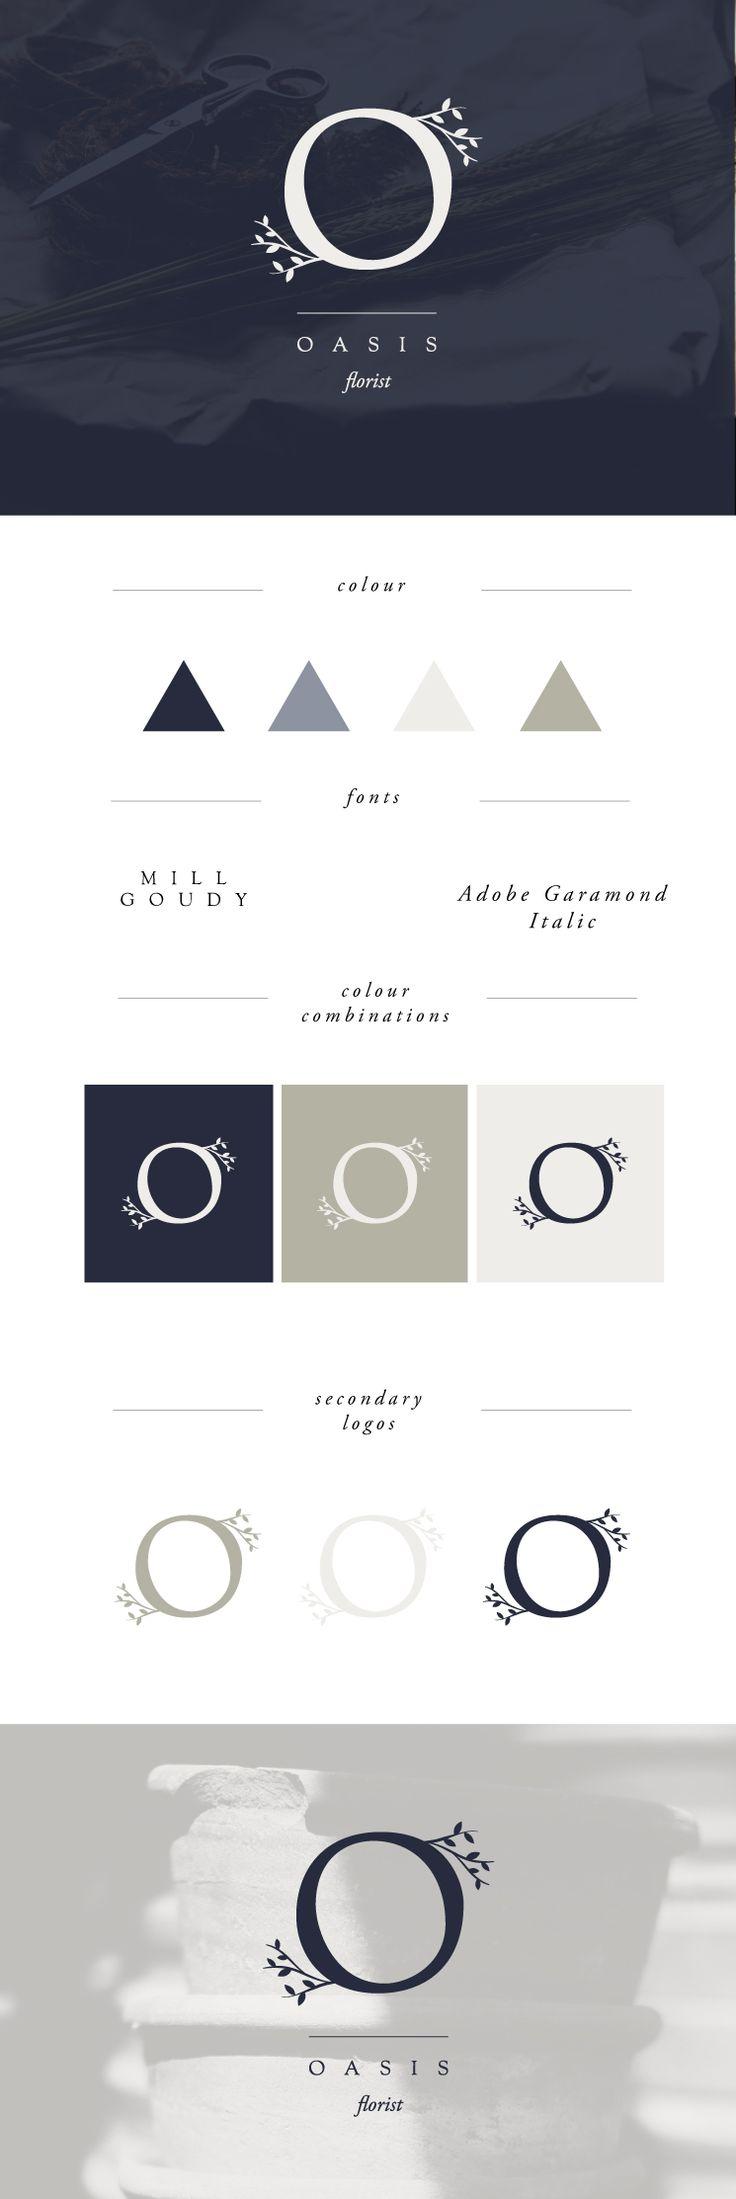 minimal design | minimal logo | logo trends 2017 | florist branding | florist logo | modern logo | O logos